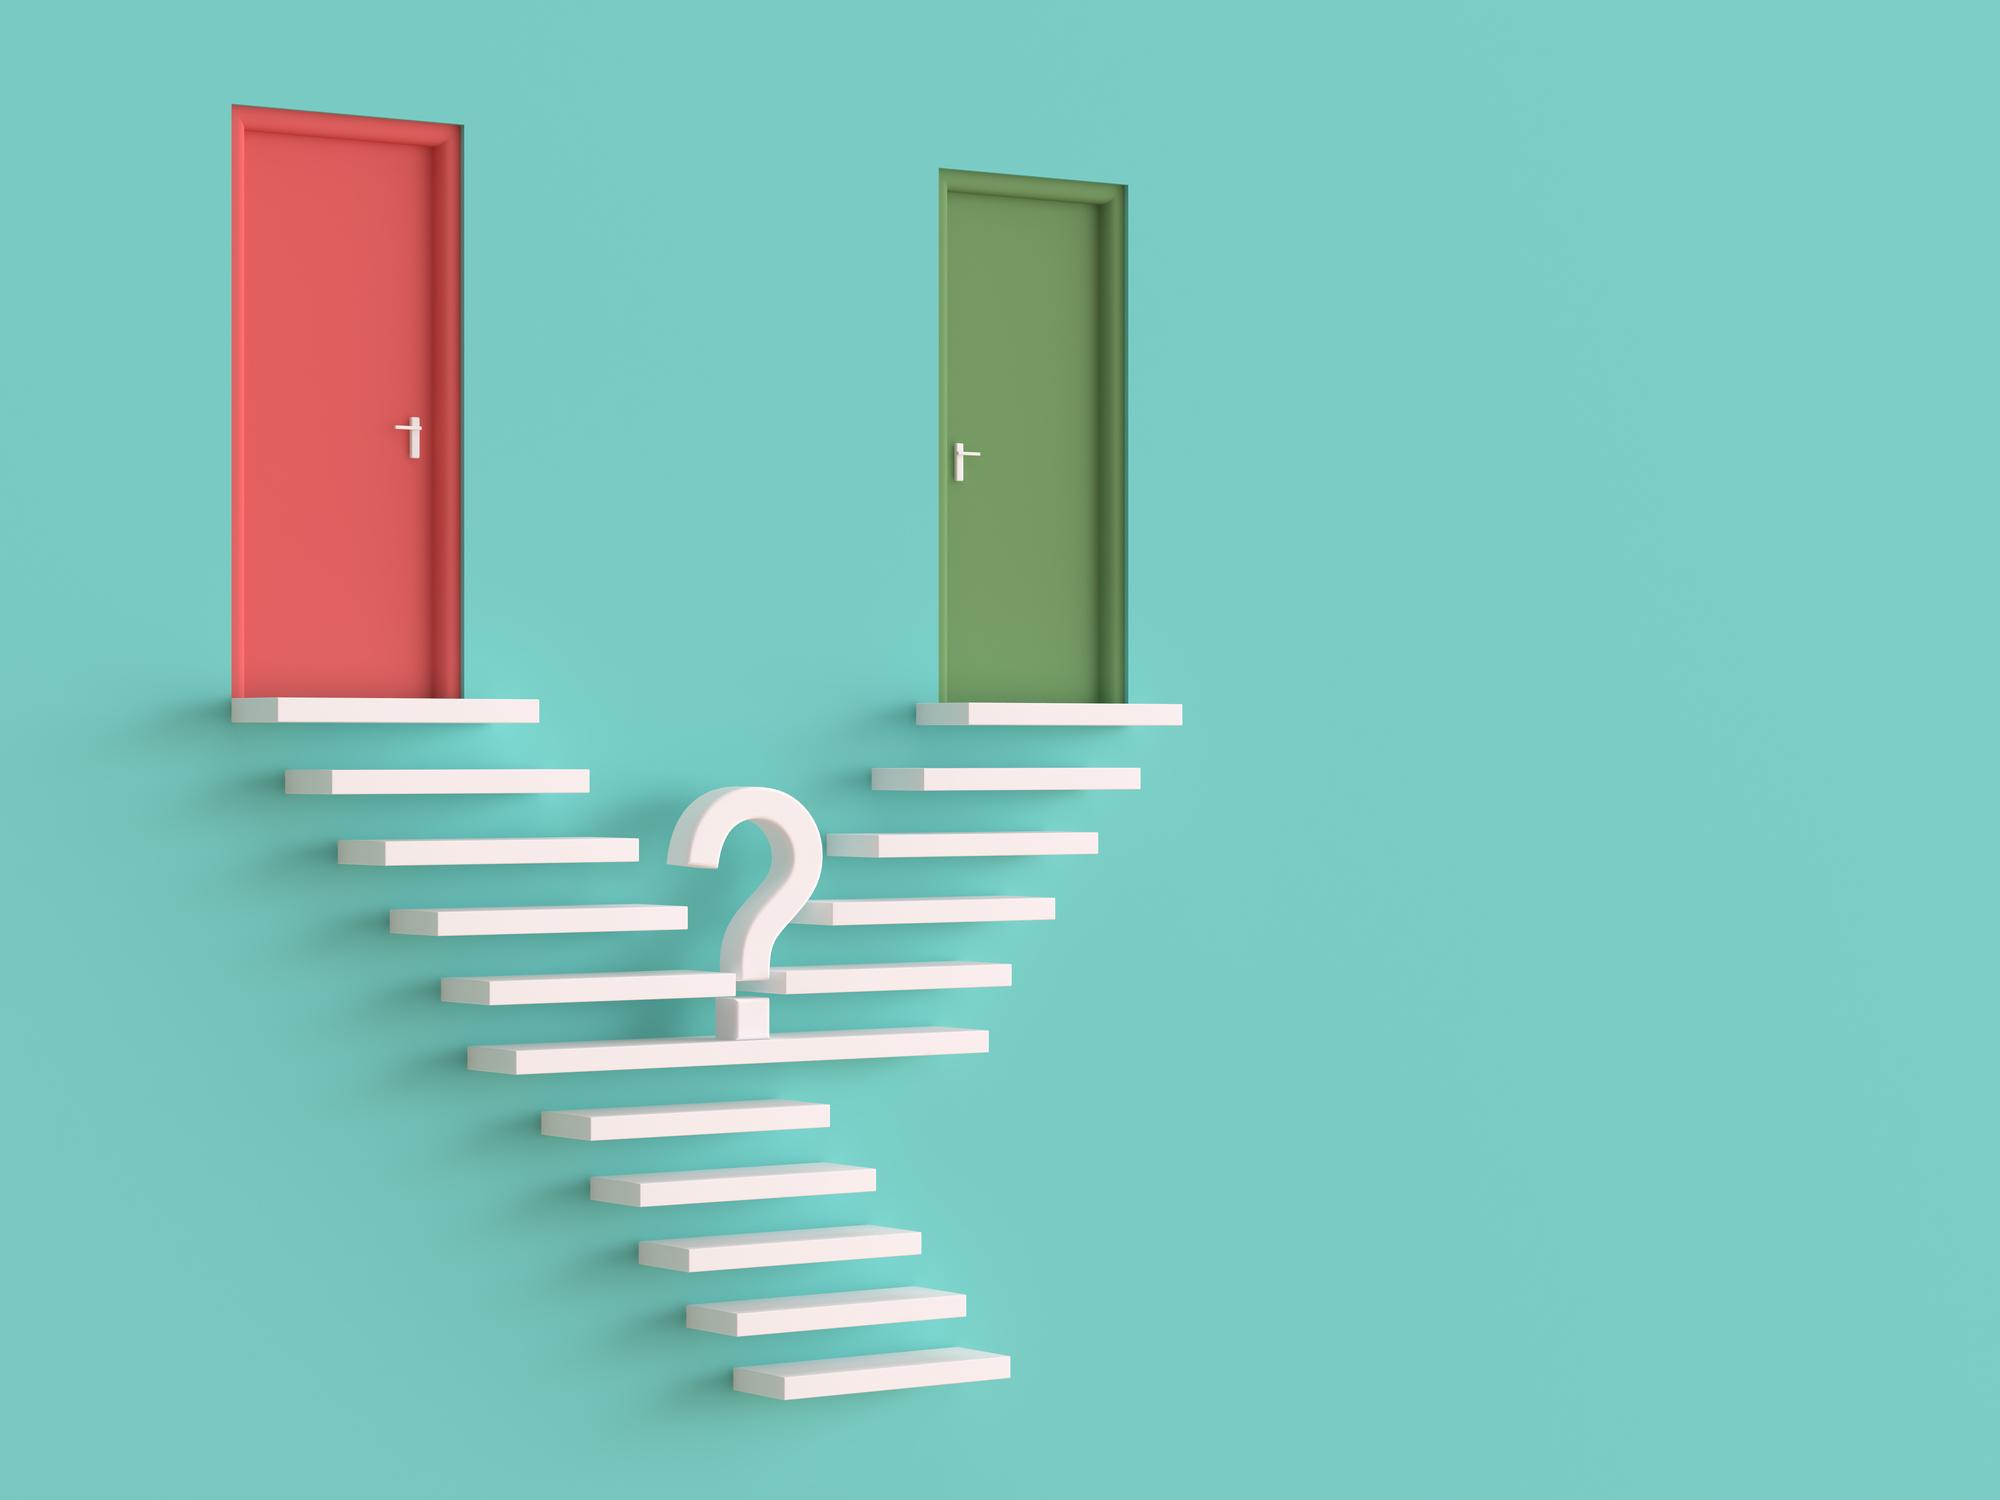 Choosing a path, two doors, two roads